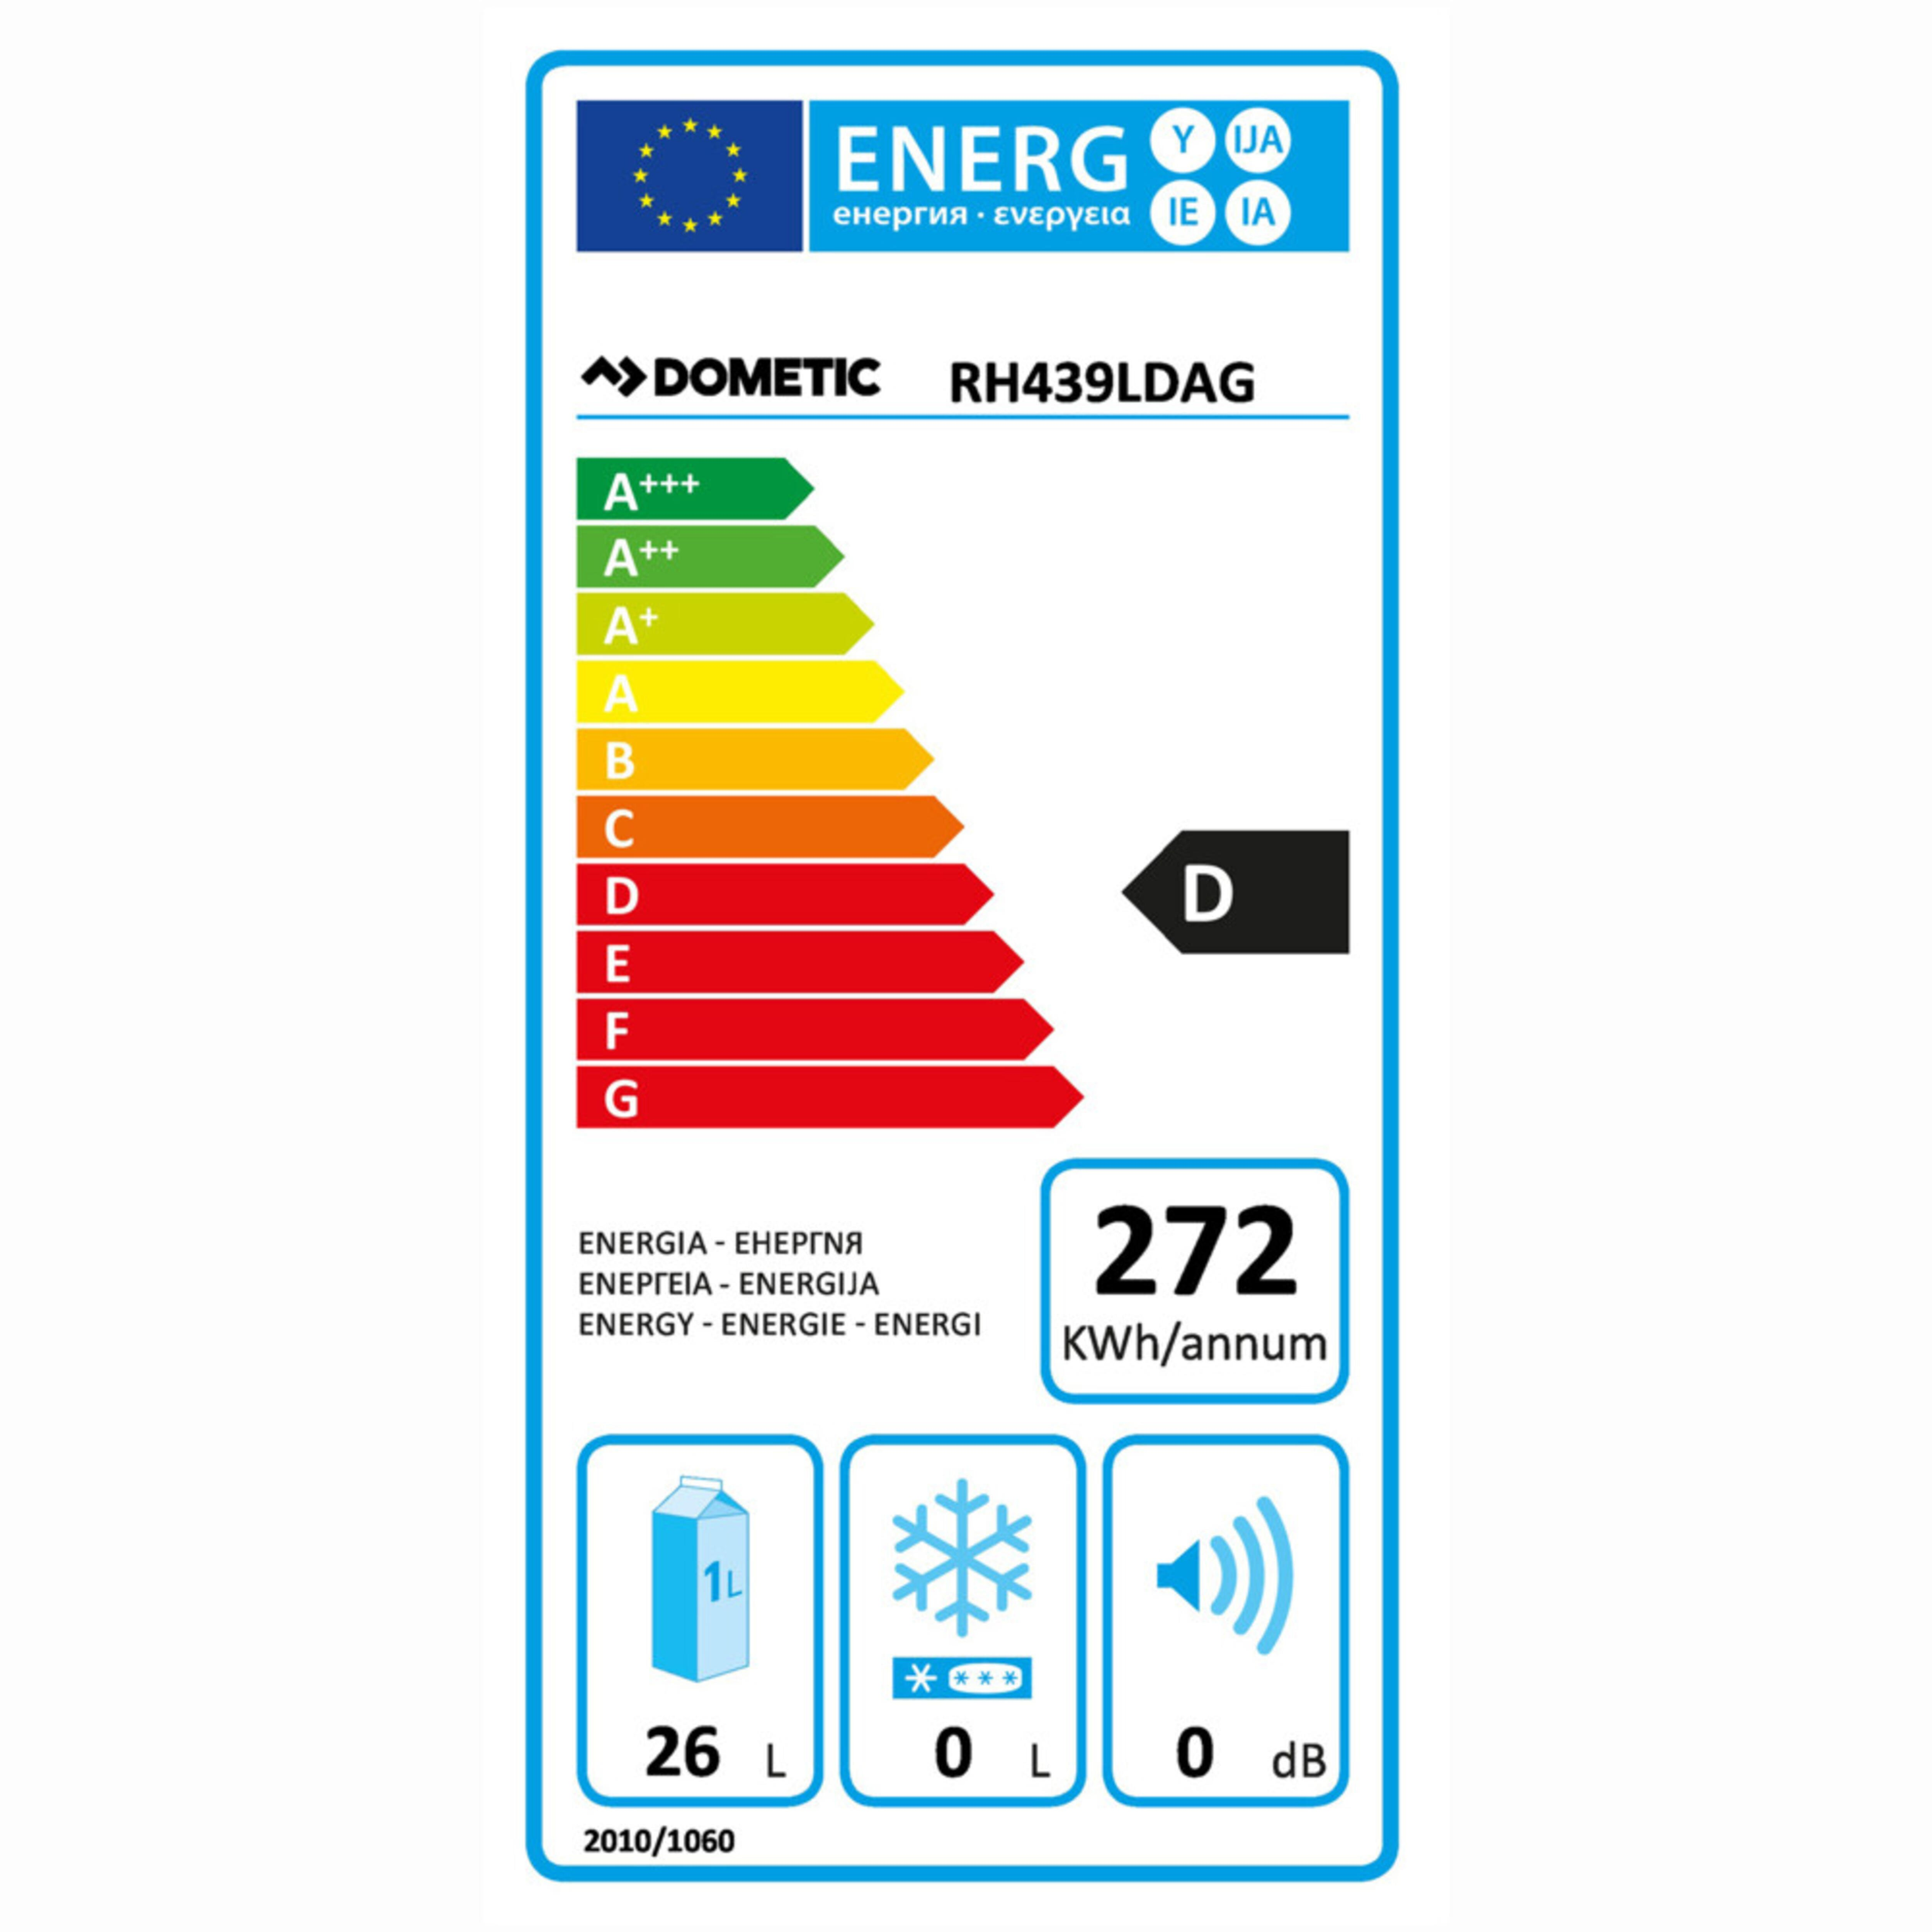 Dometic RH 439 LDAG Energiamerkki